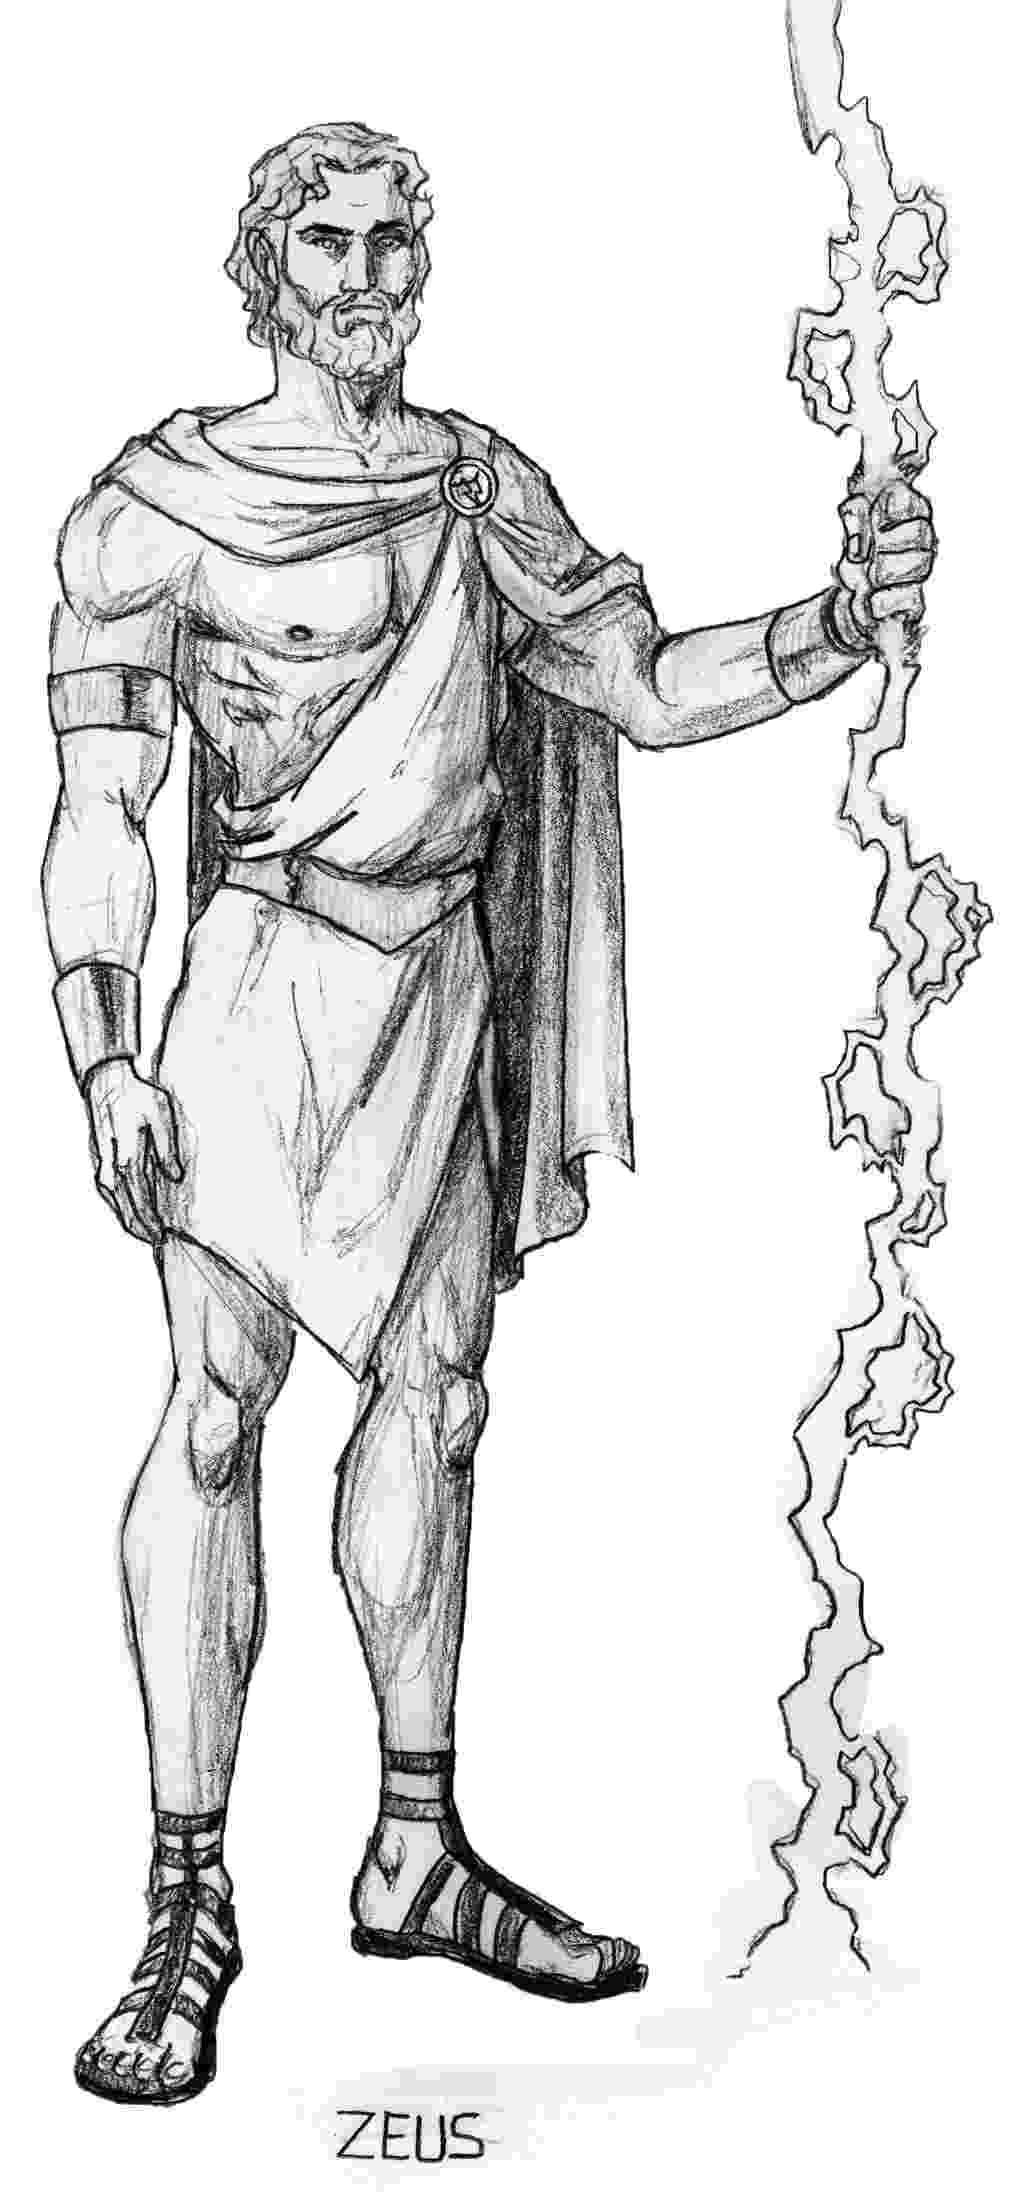 sketch of zeus zeus creates a new god sketch drawing cartoon funny zeus sketch of